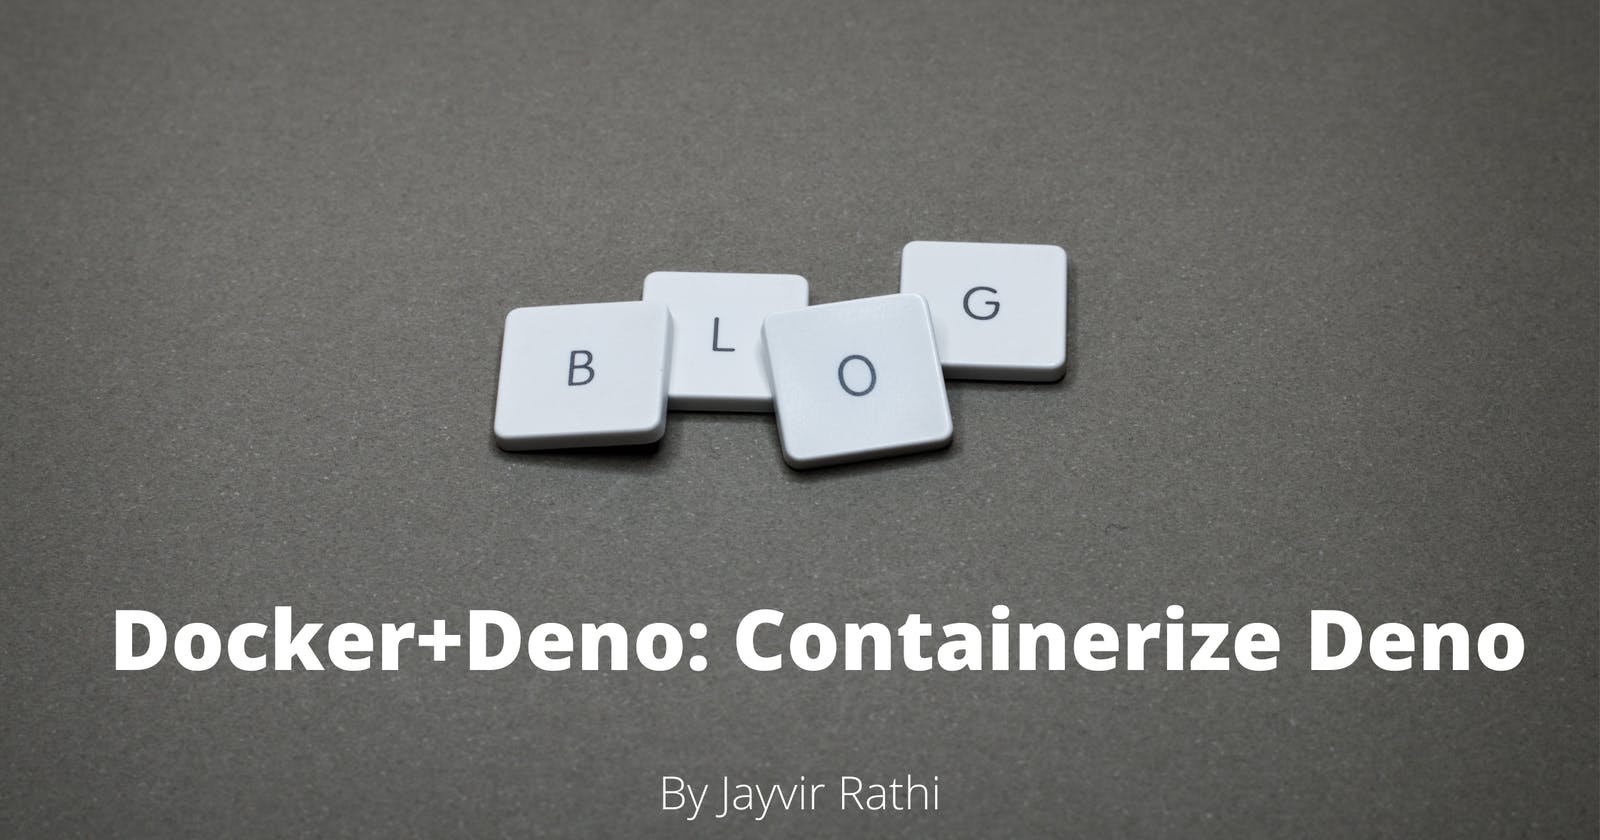 Docker+Deno: Containerize  Deno